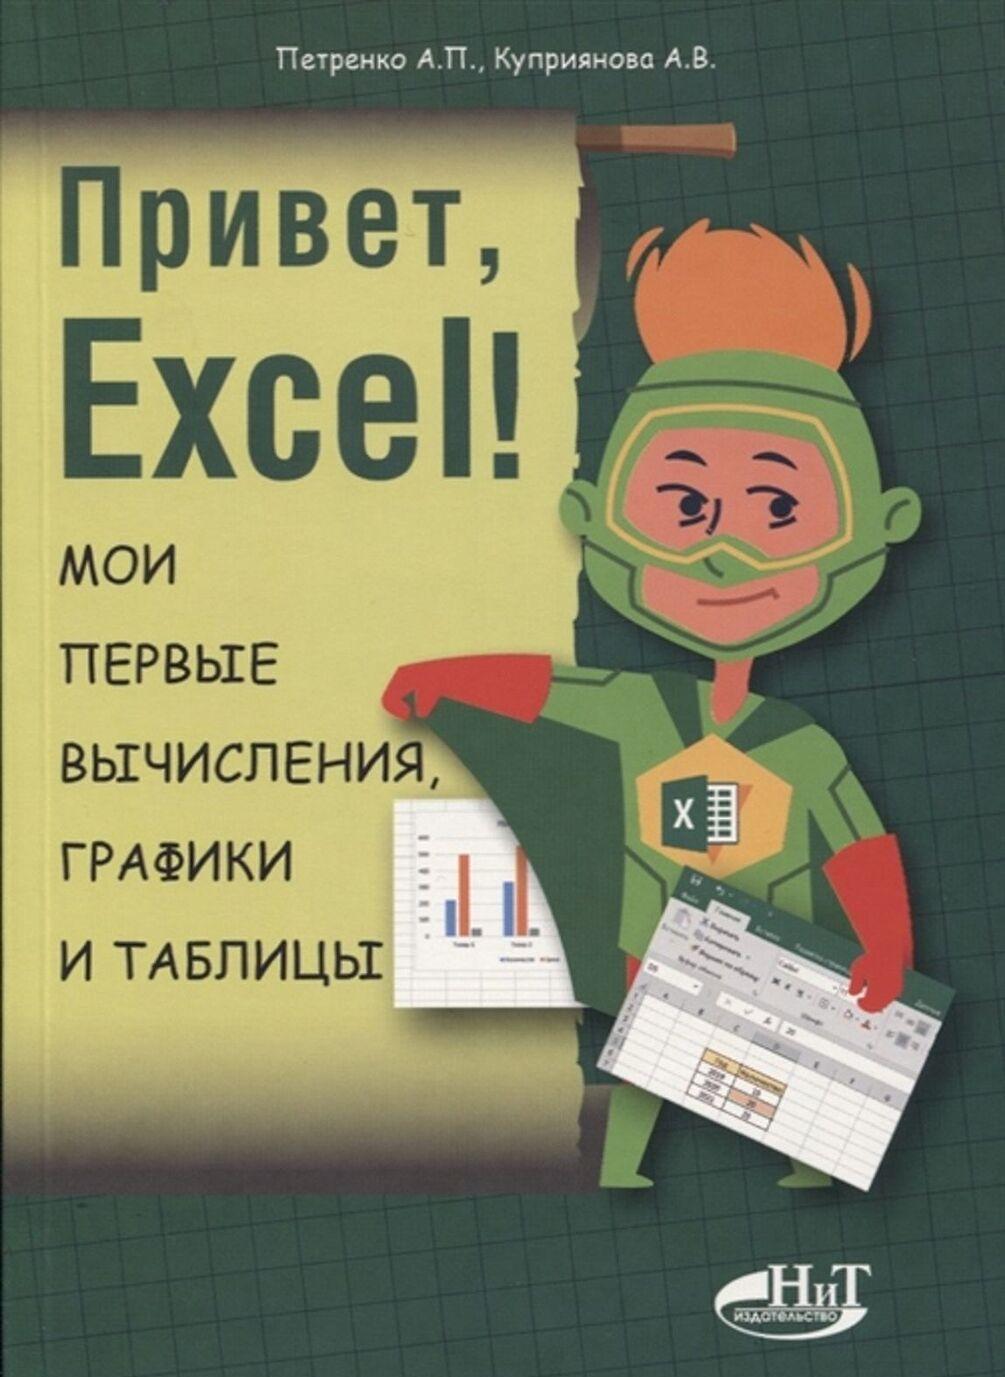 Privet, Excel!  Moi pervye vychislenija, grafiki i tablitsy